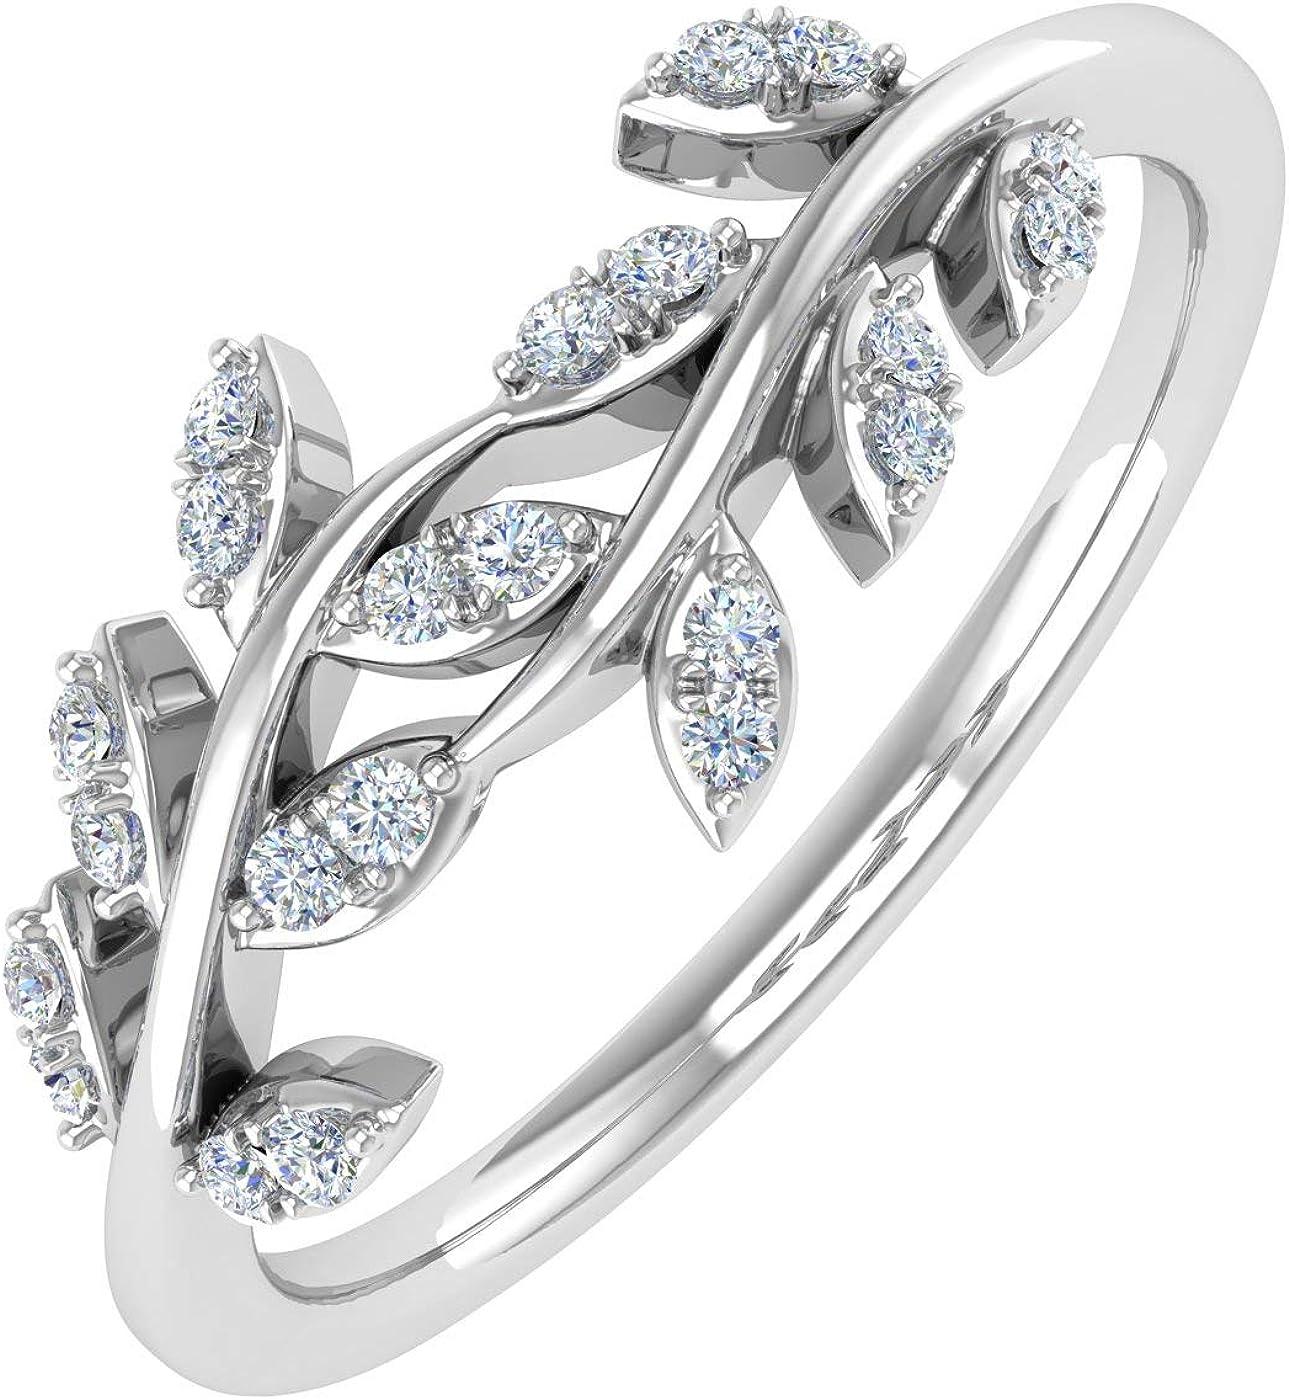 10K Gold Diamond Nature Wedding Band (0.15 Carat)